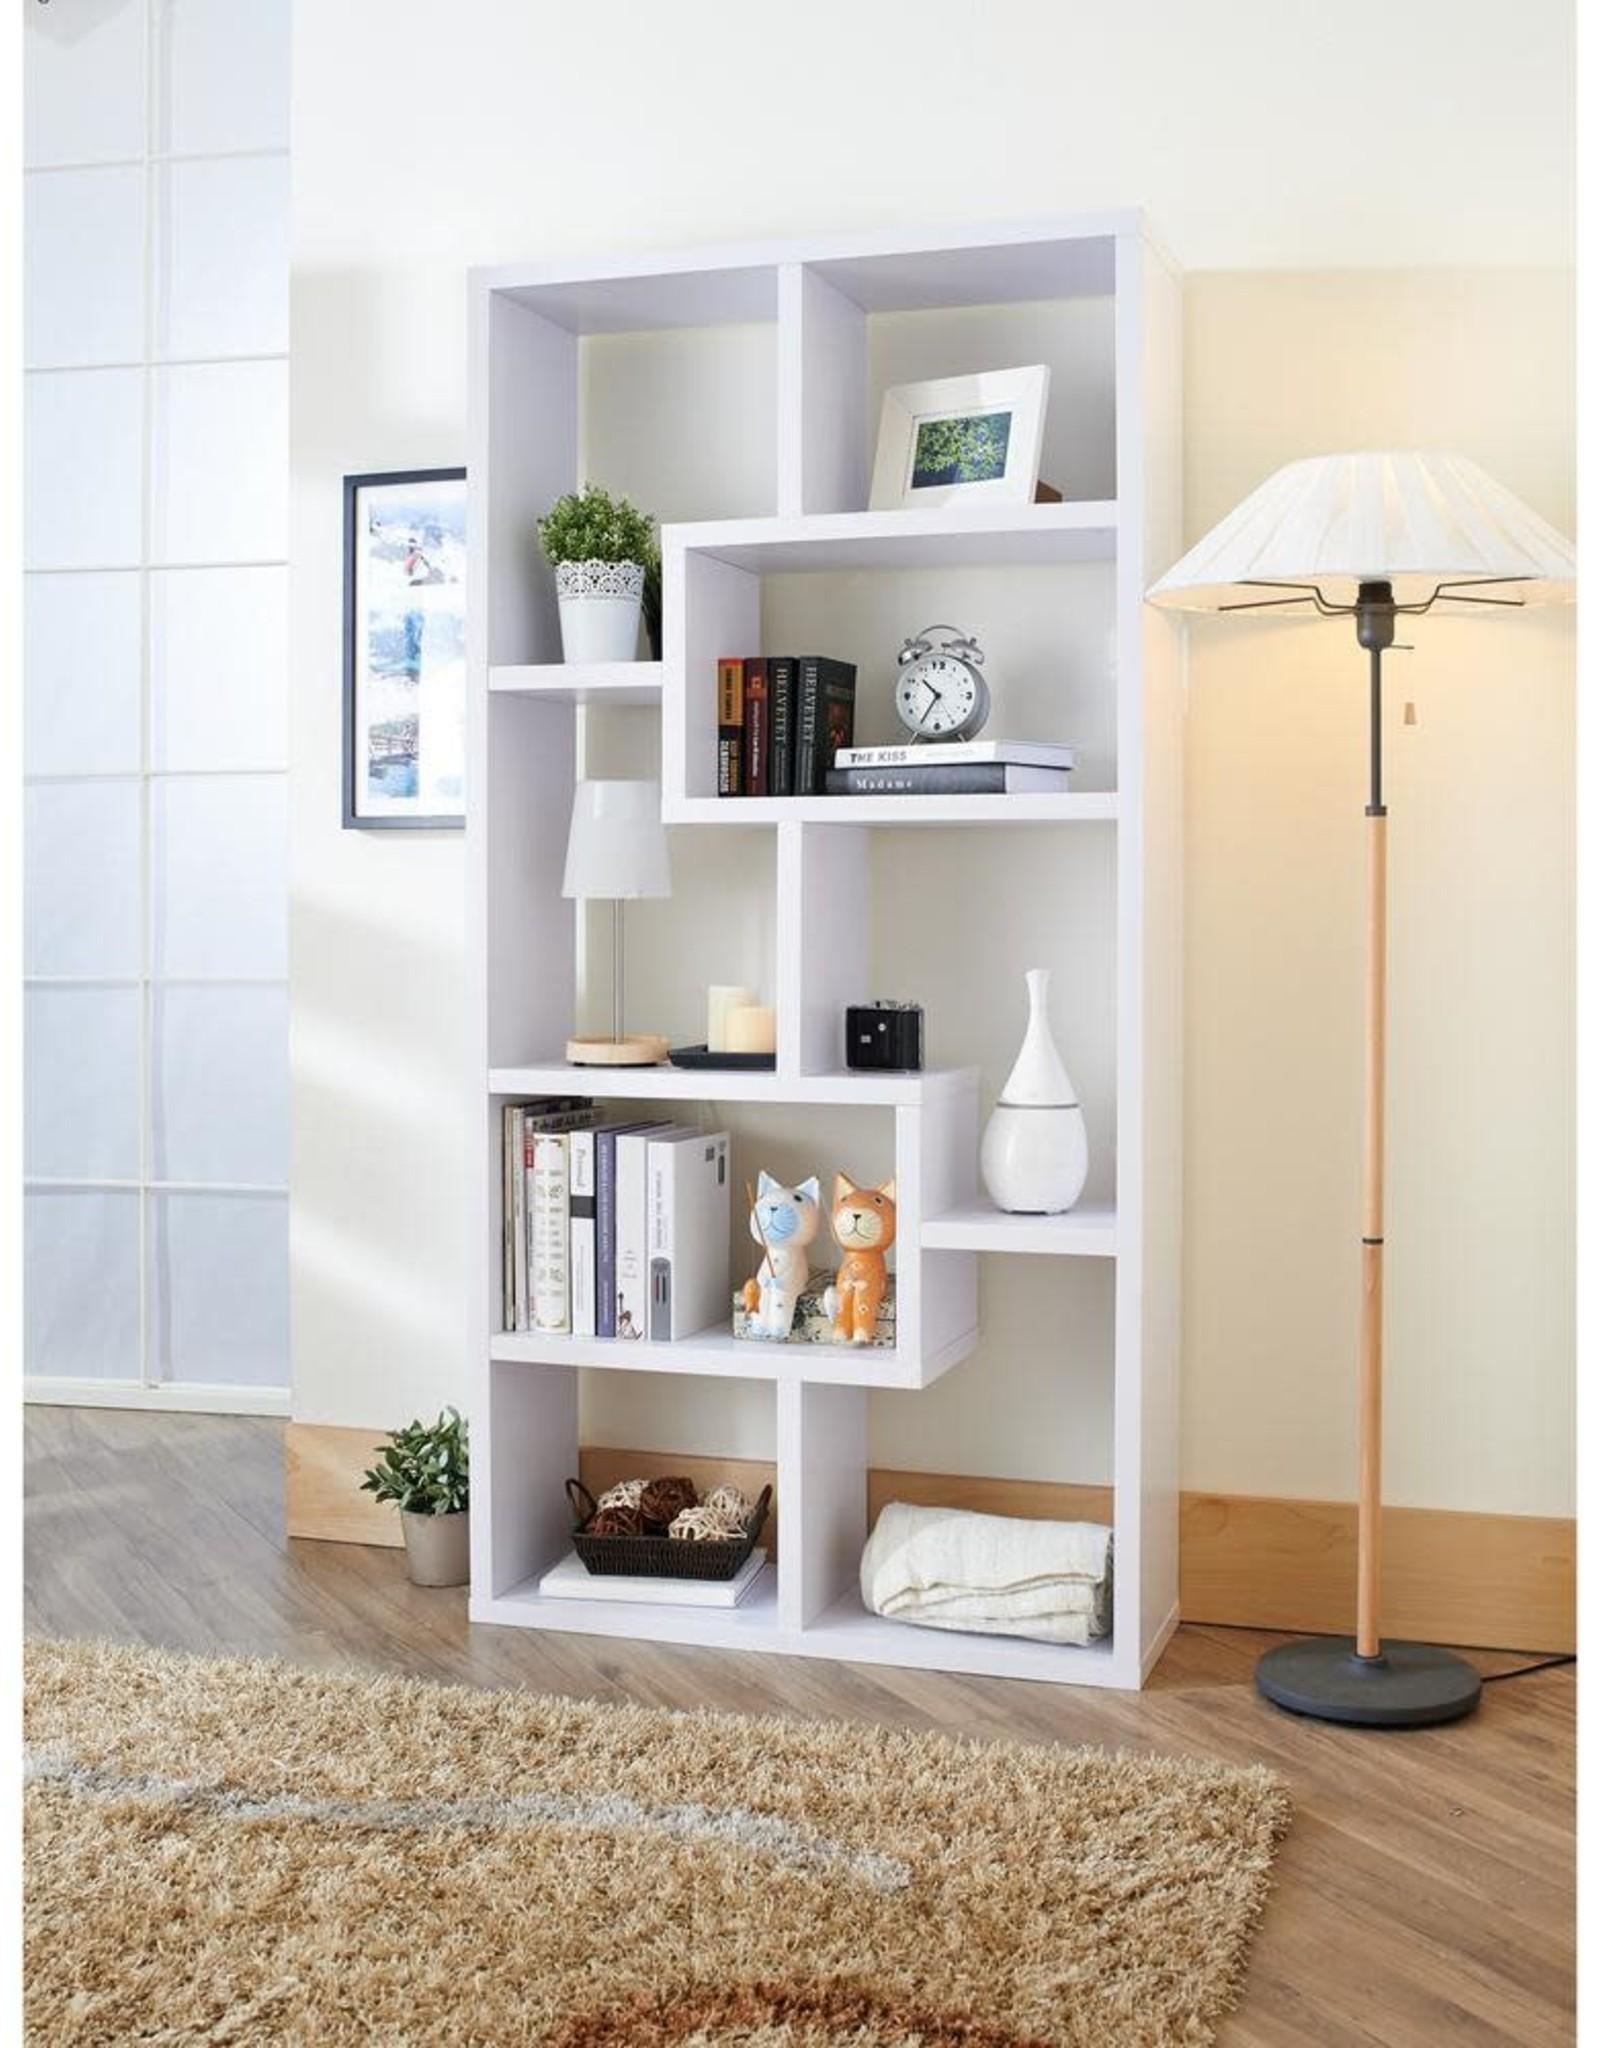 Furniture of America Dore 71 in. White Wood 8-shelf Standard Bookcase with Open Back